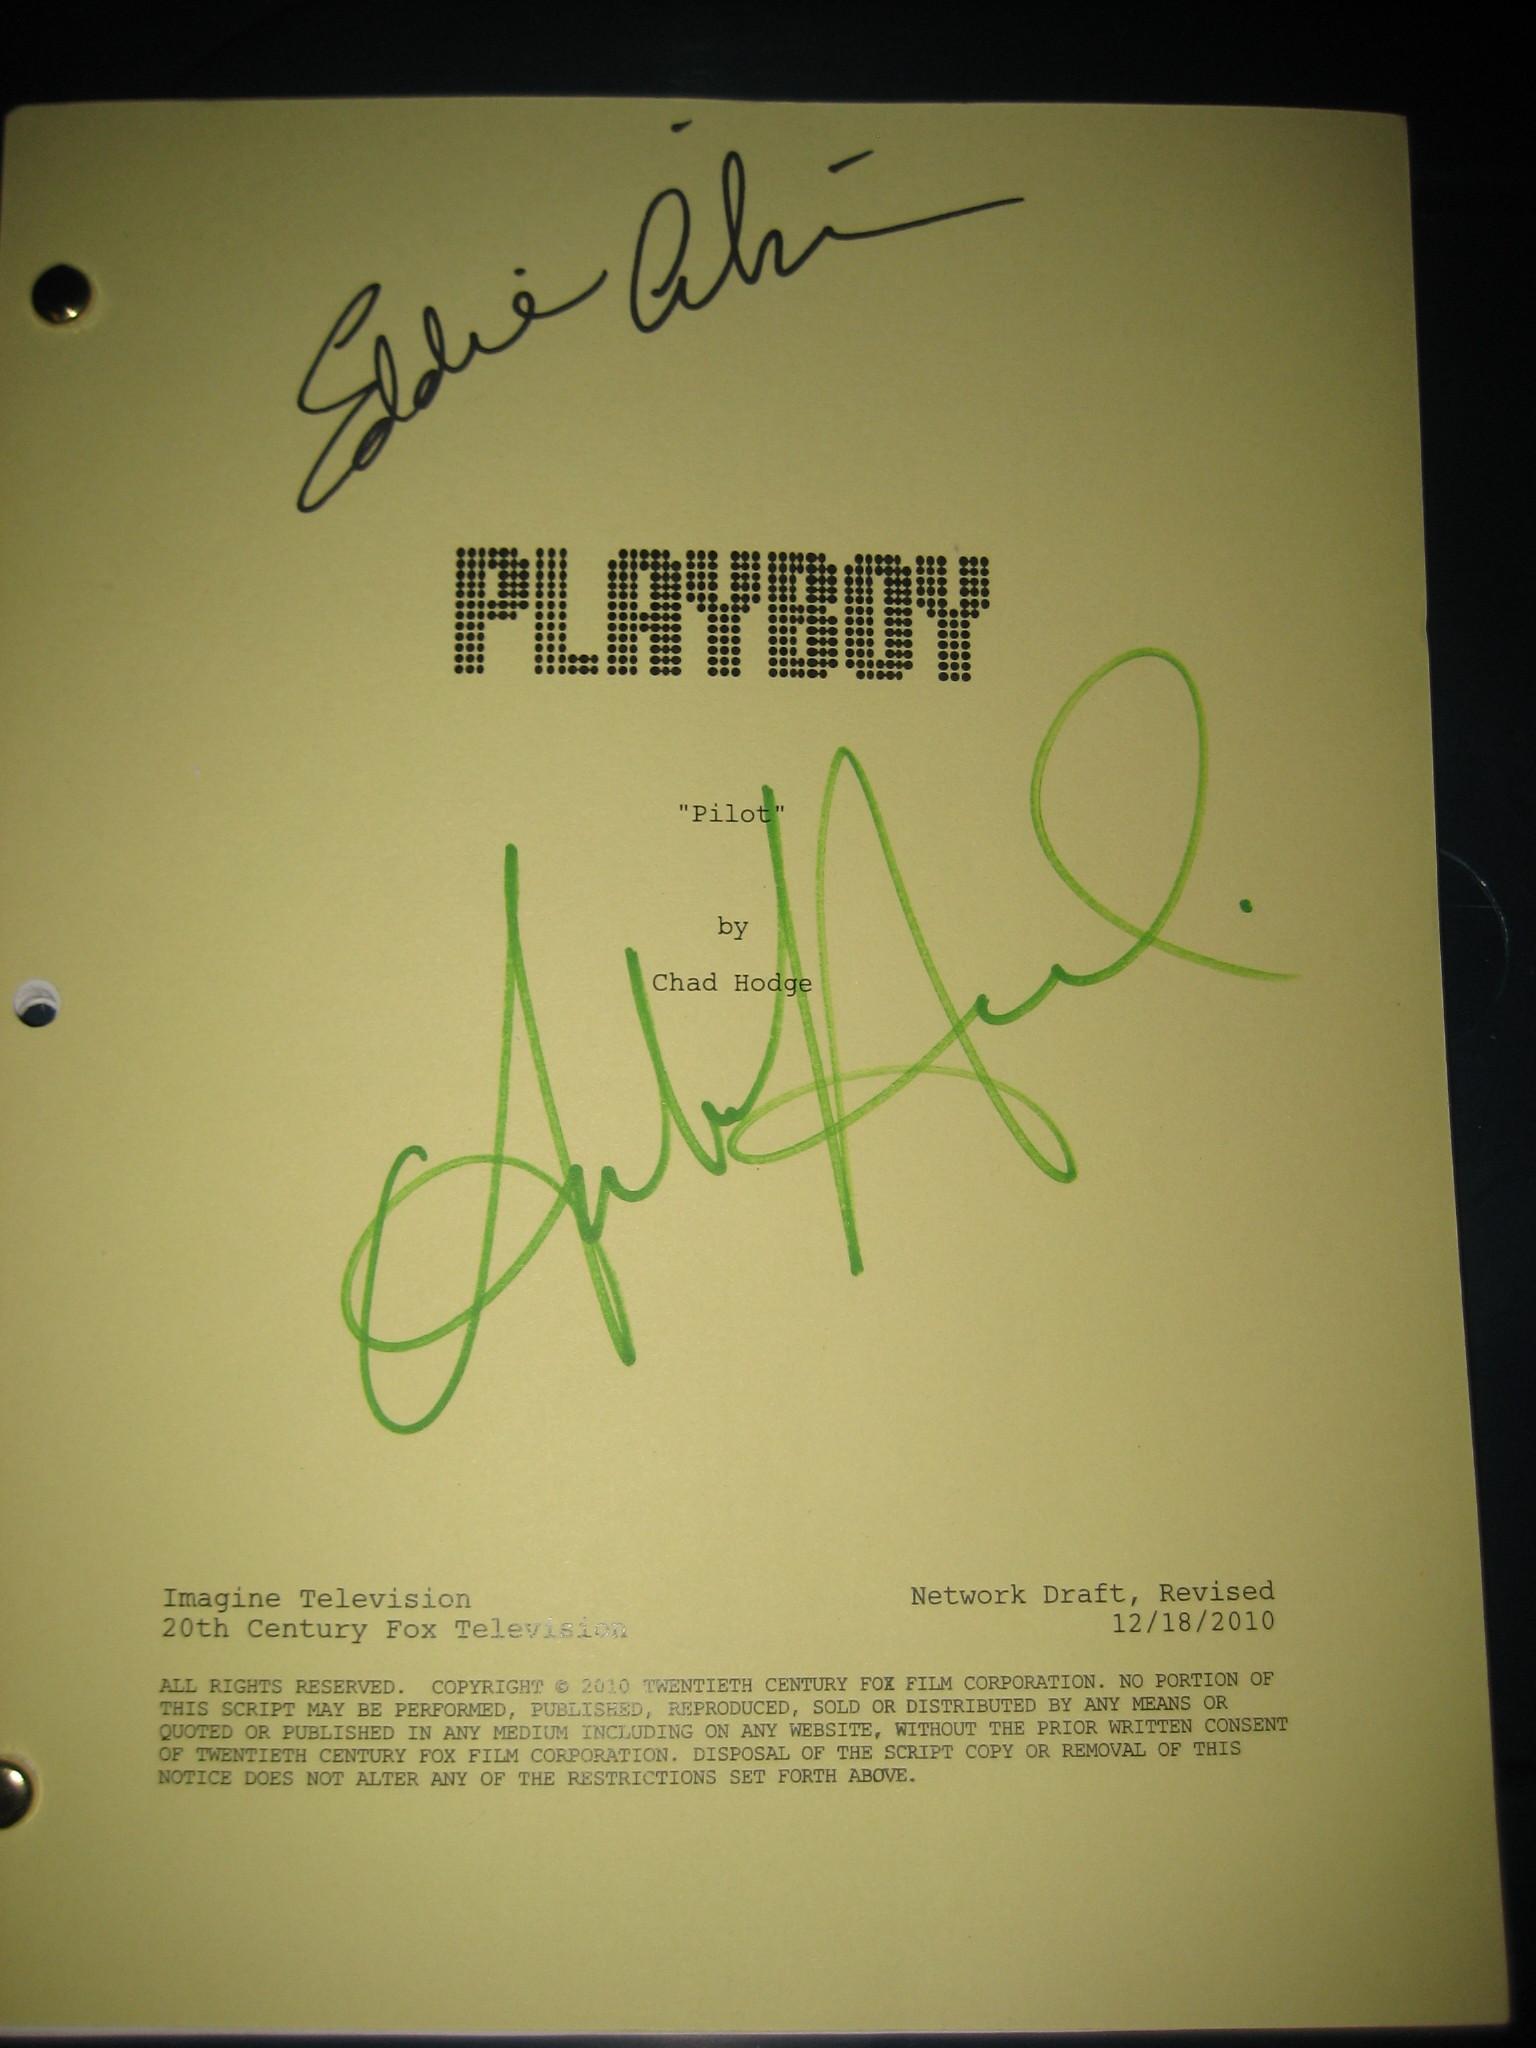 Playboy Club Pilot Script